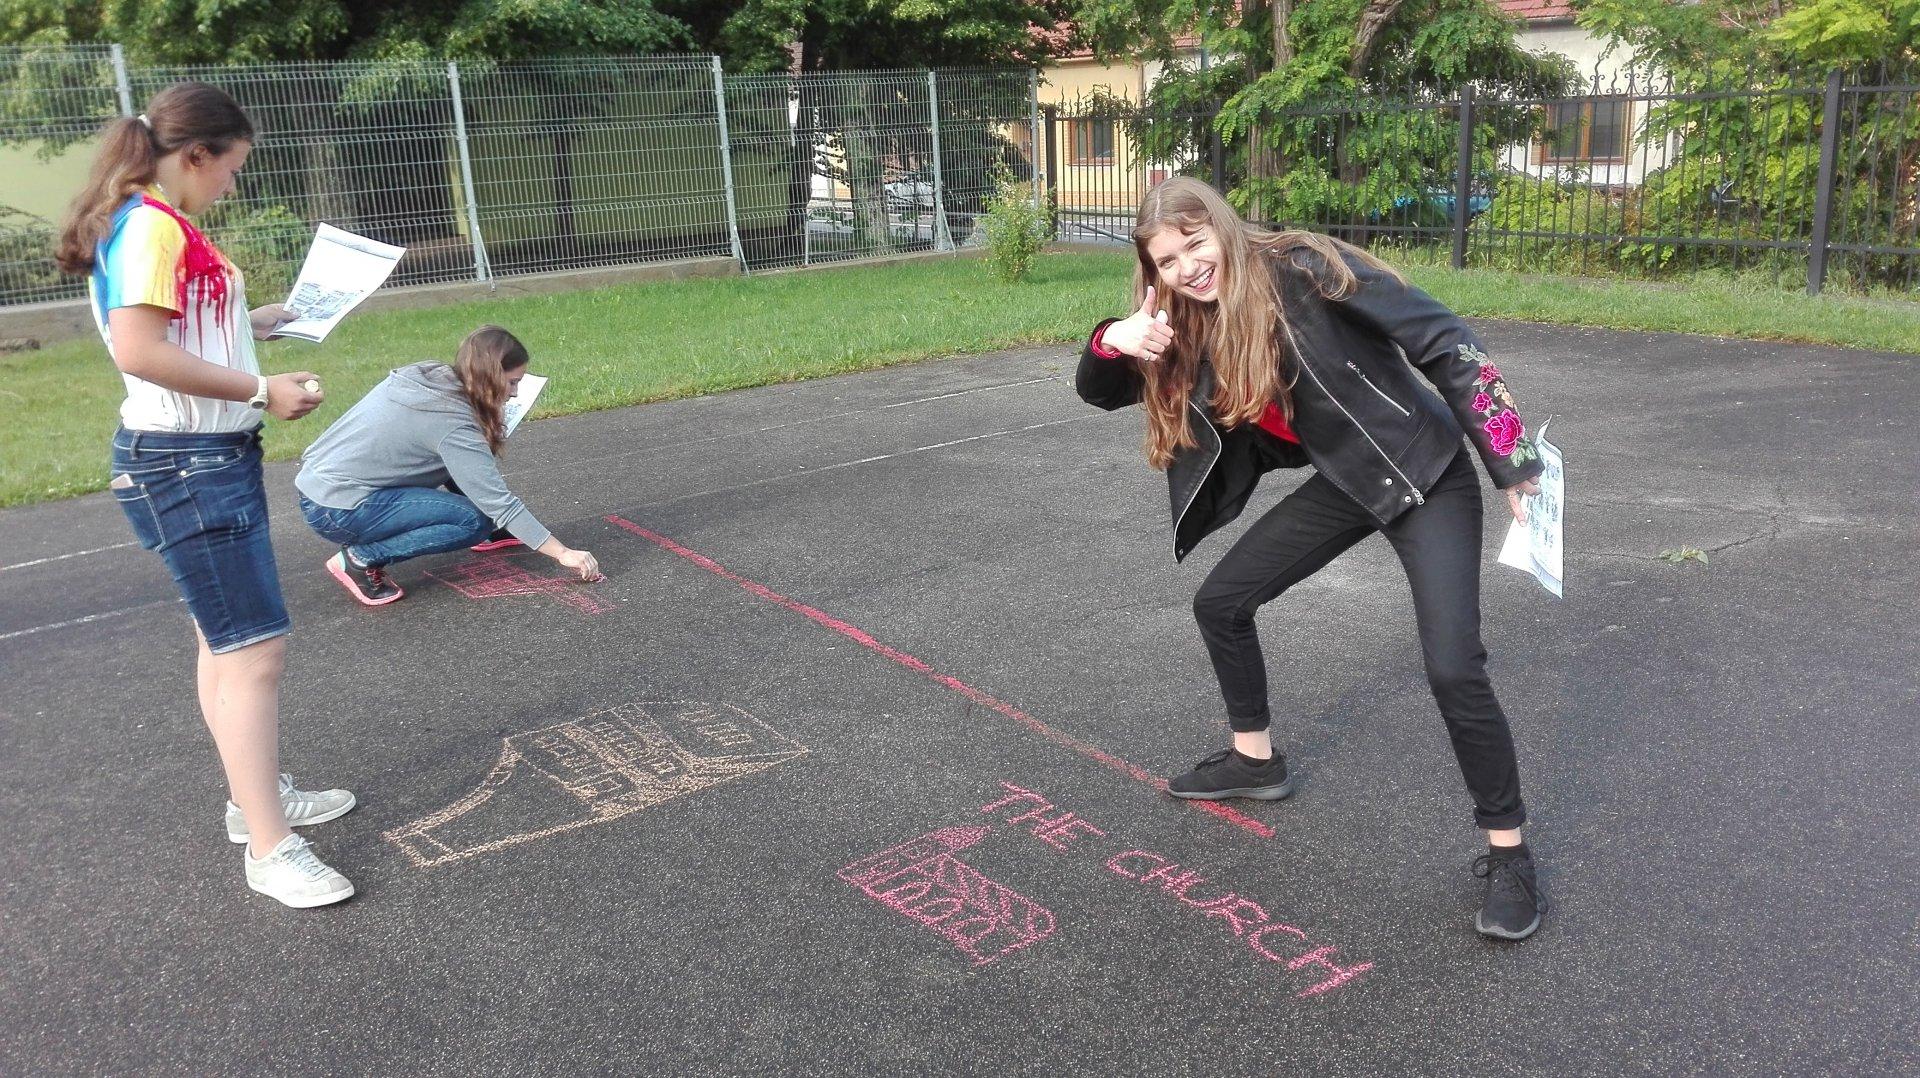 Outdoorová aktivita v anglickém jazyce